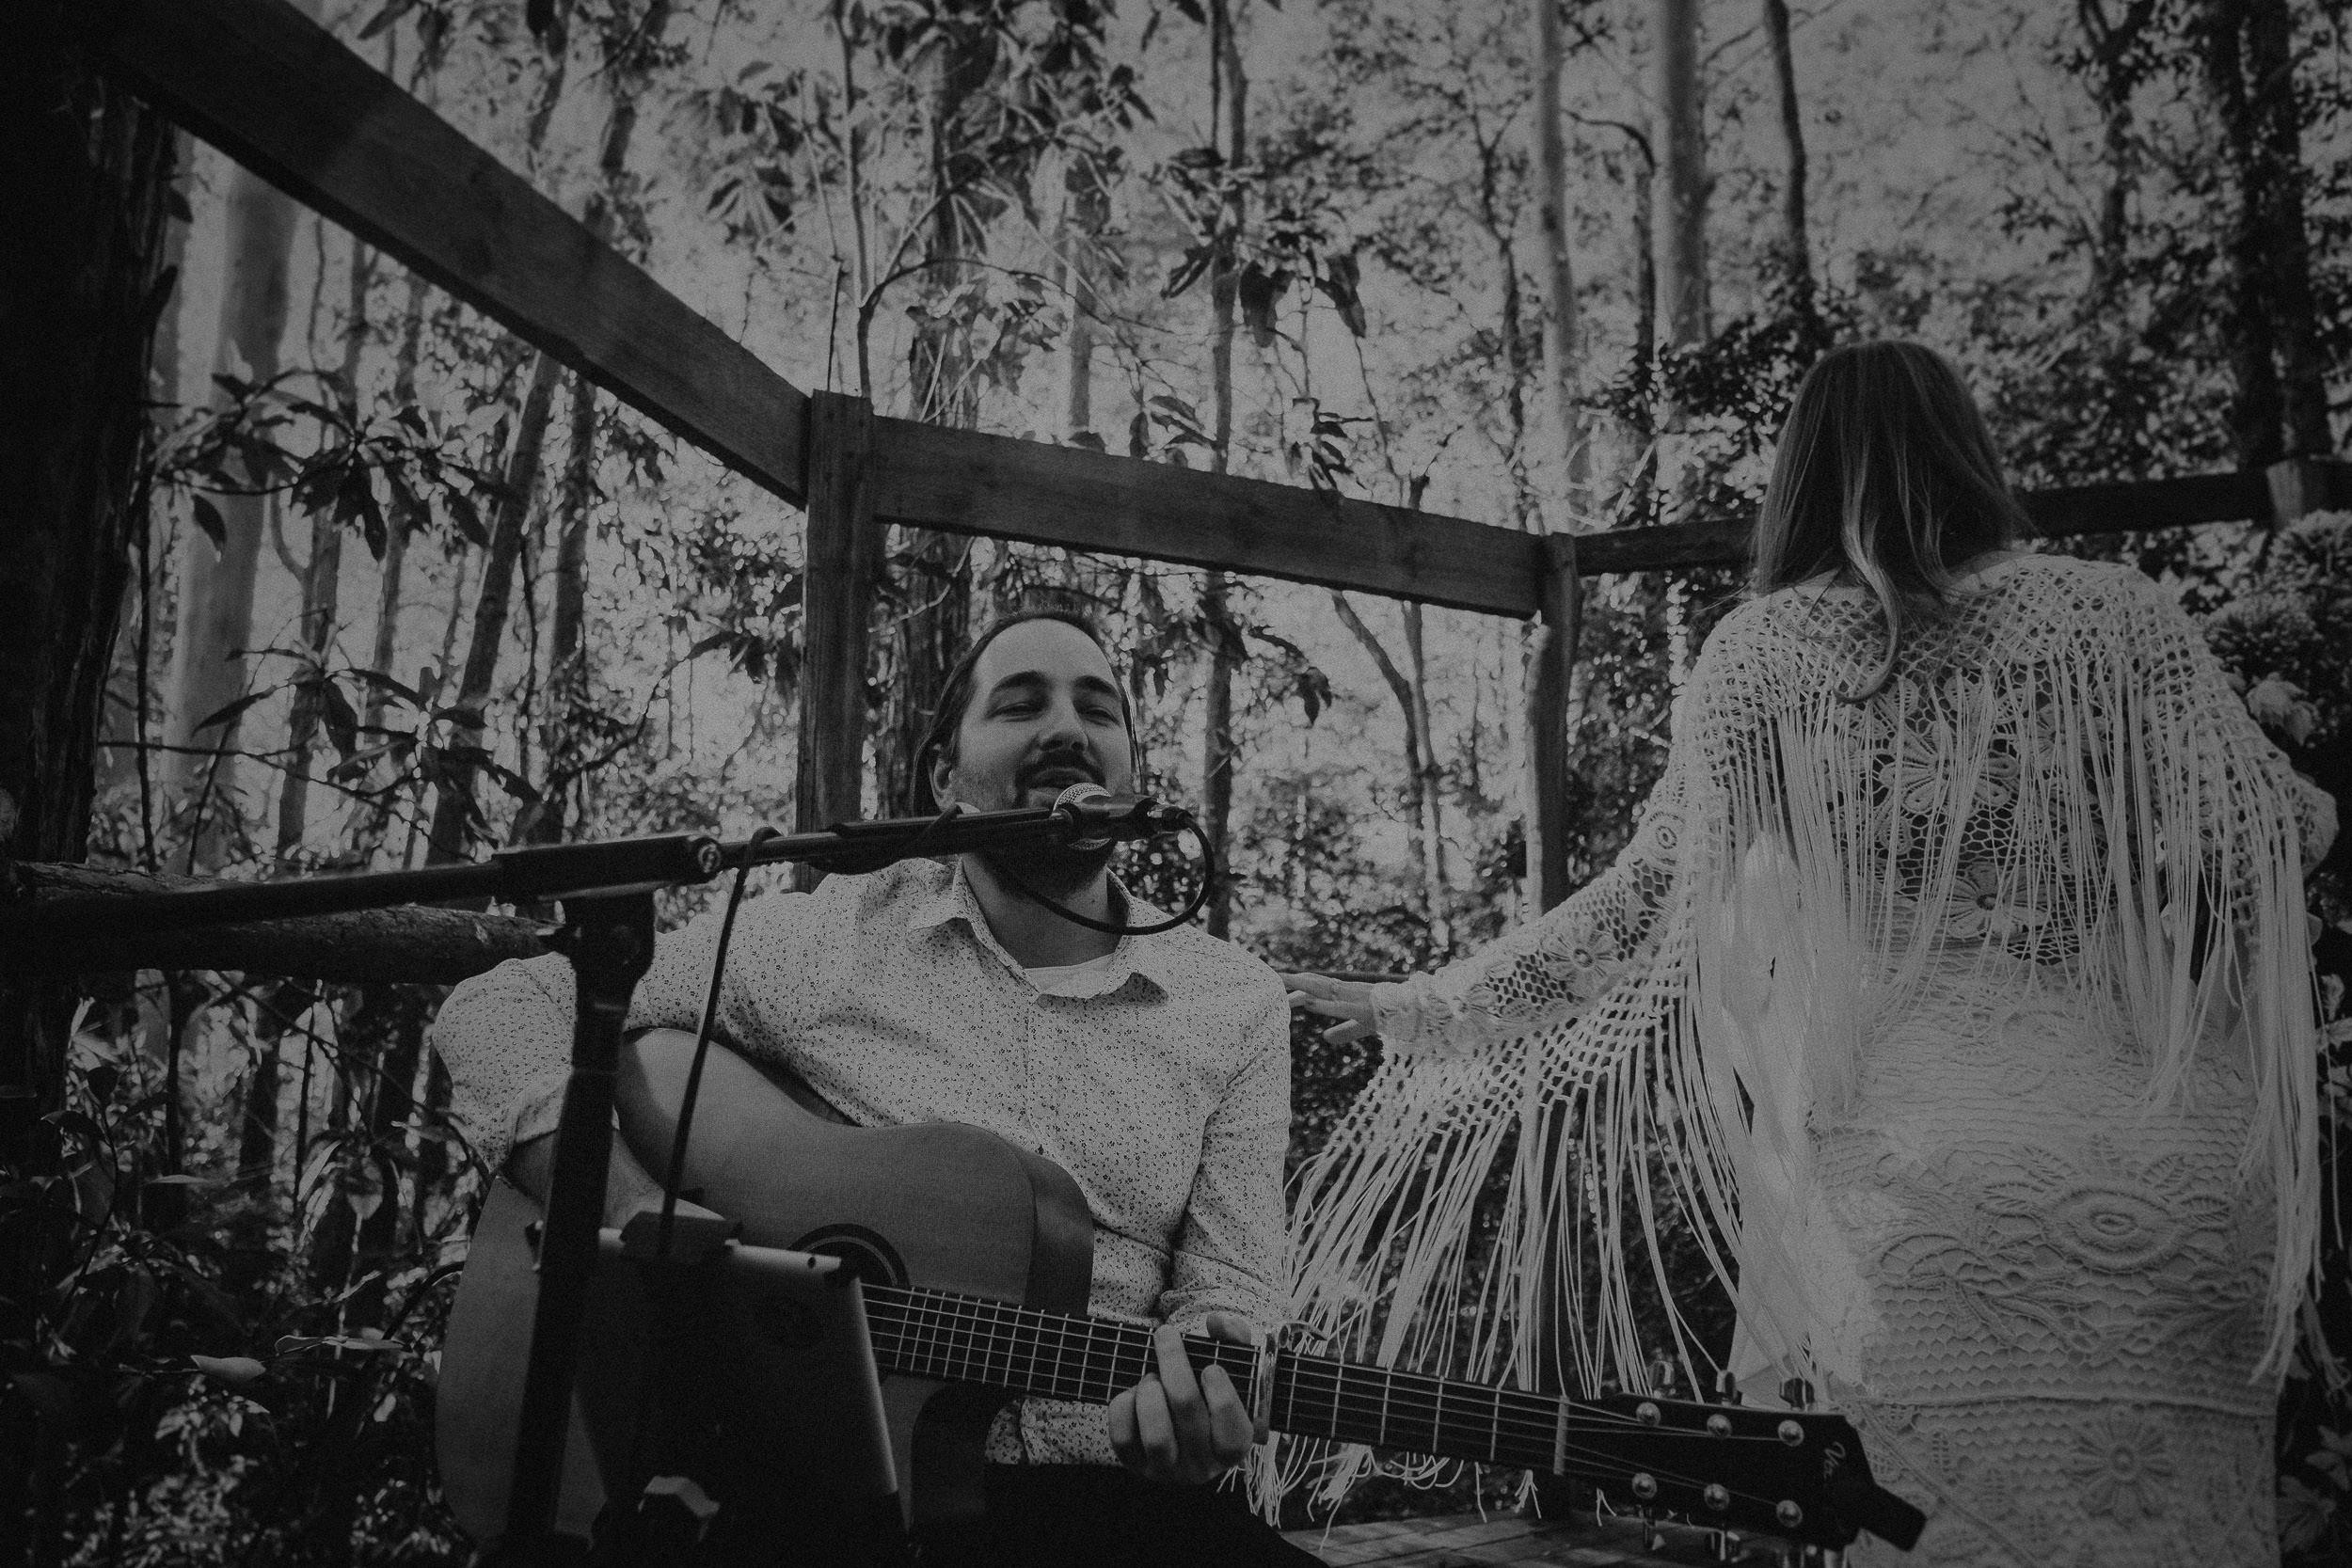 S&A Elopement - Kings & Thieves - Shred 'Til Dead - Central Coast Beach Forest Wedding - 273.jpg